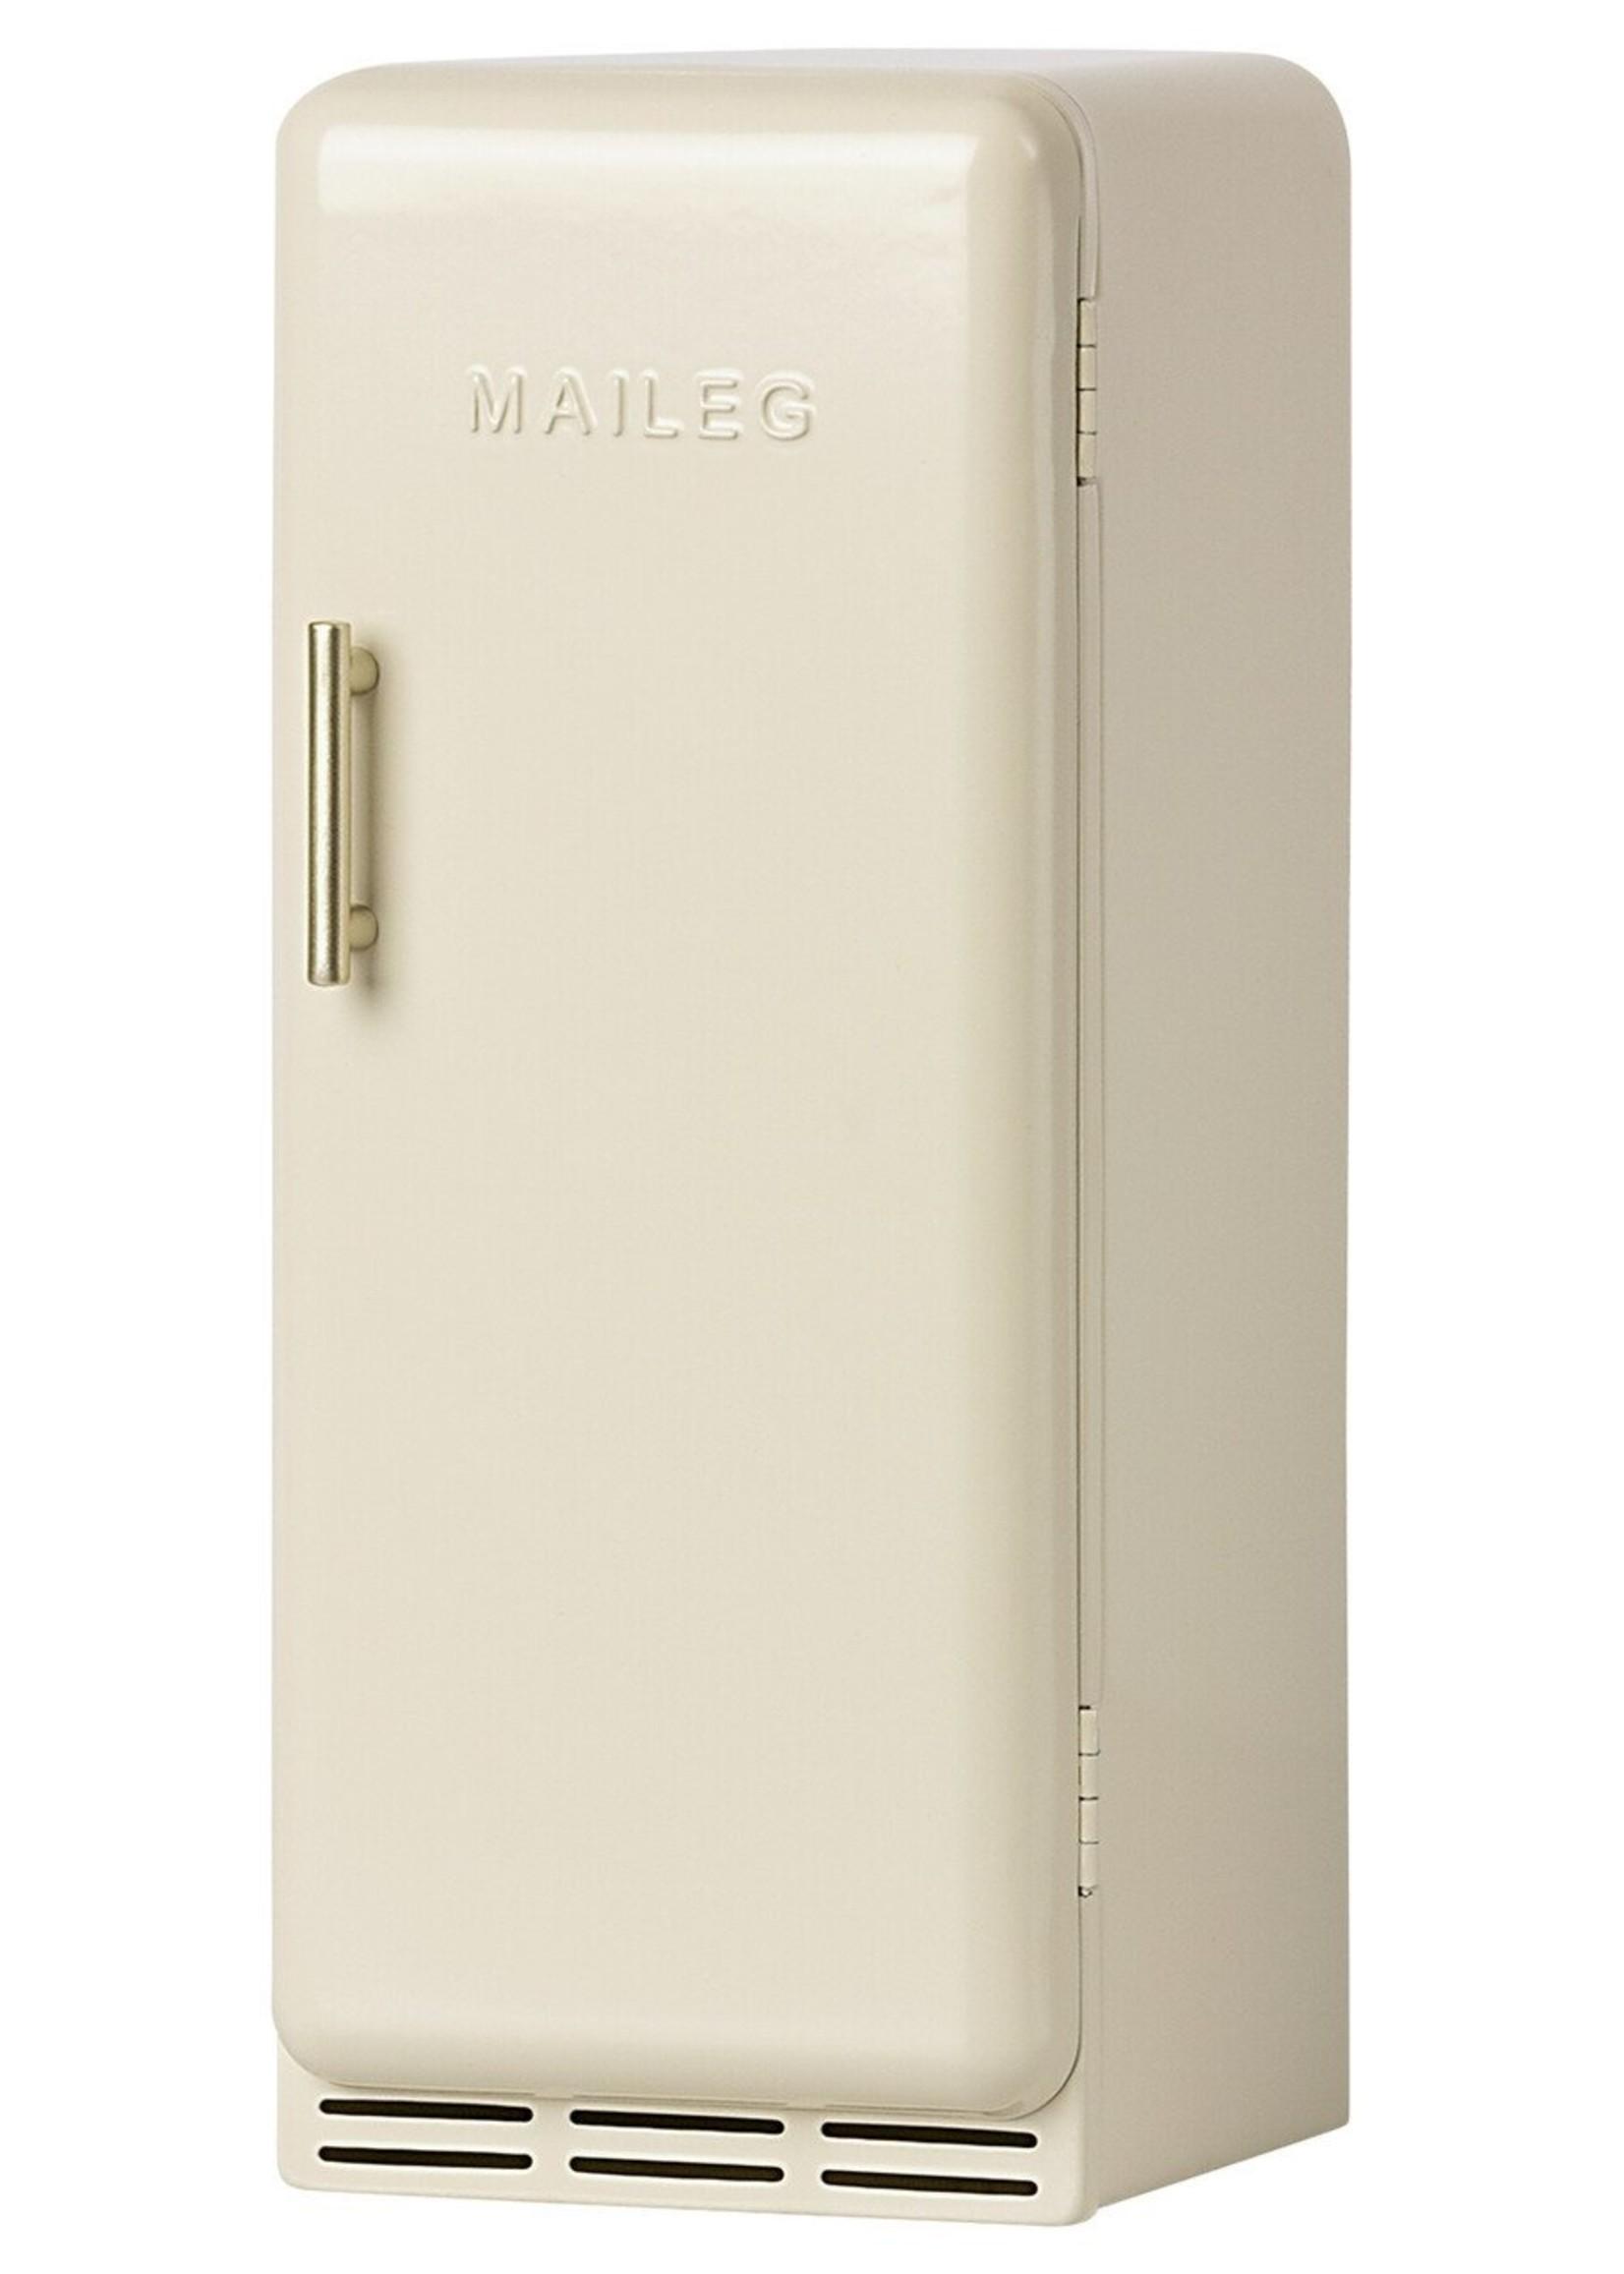 maileg Miniature Fridge- Off white